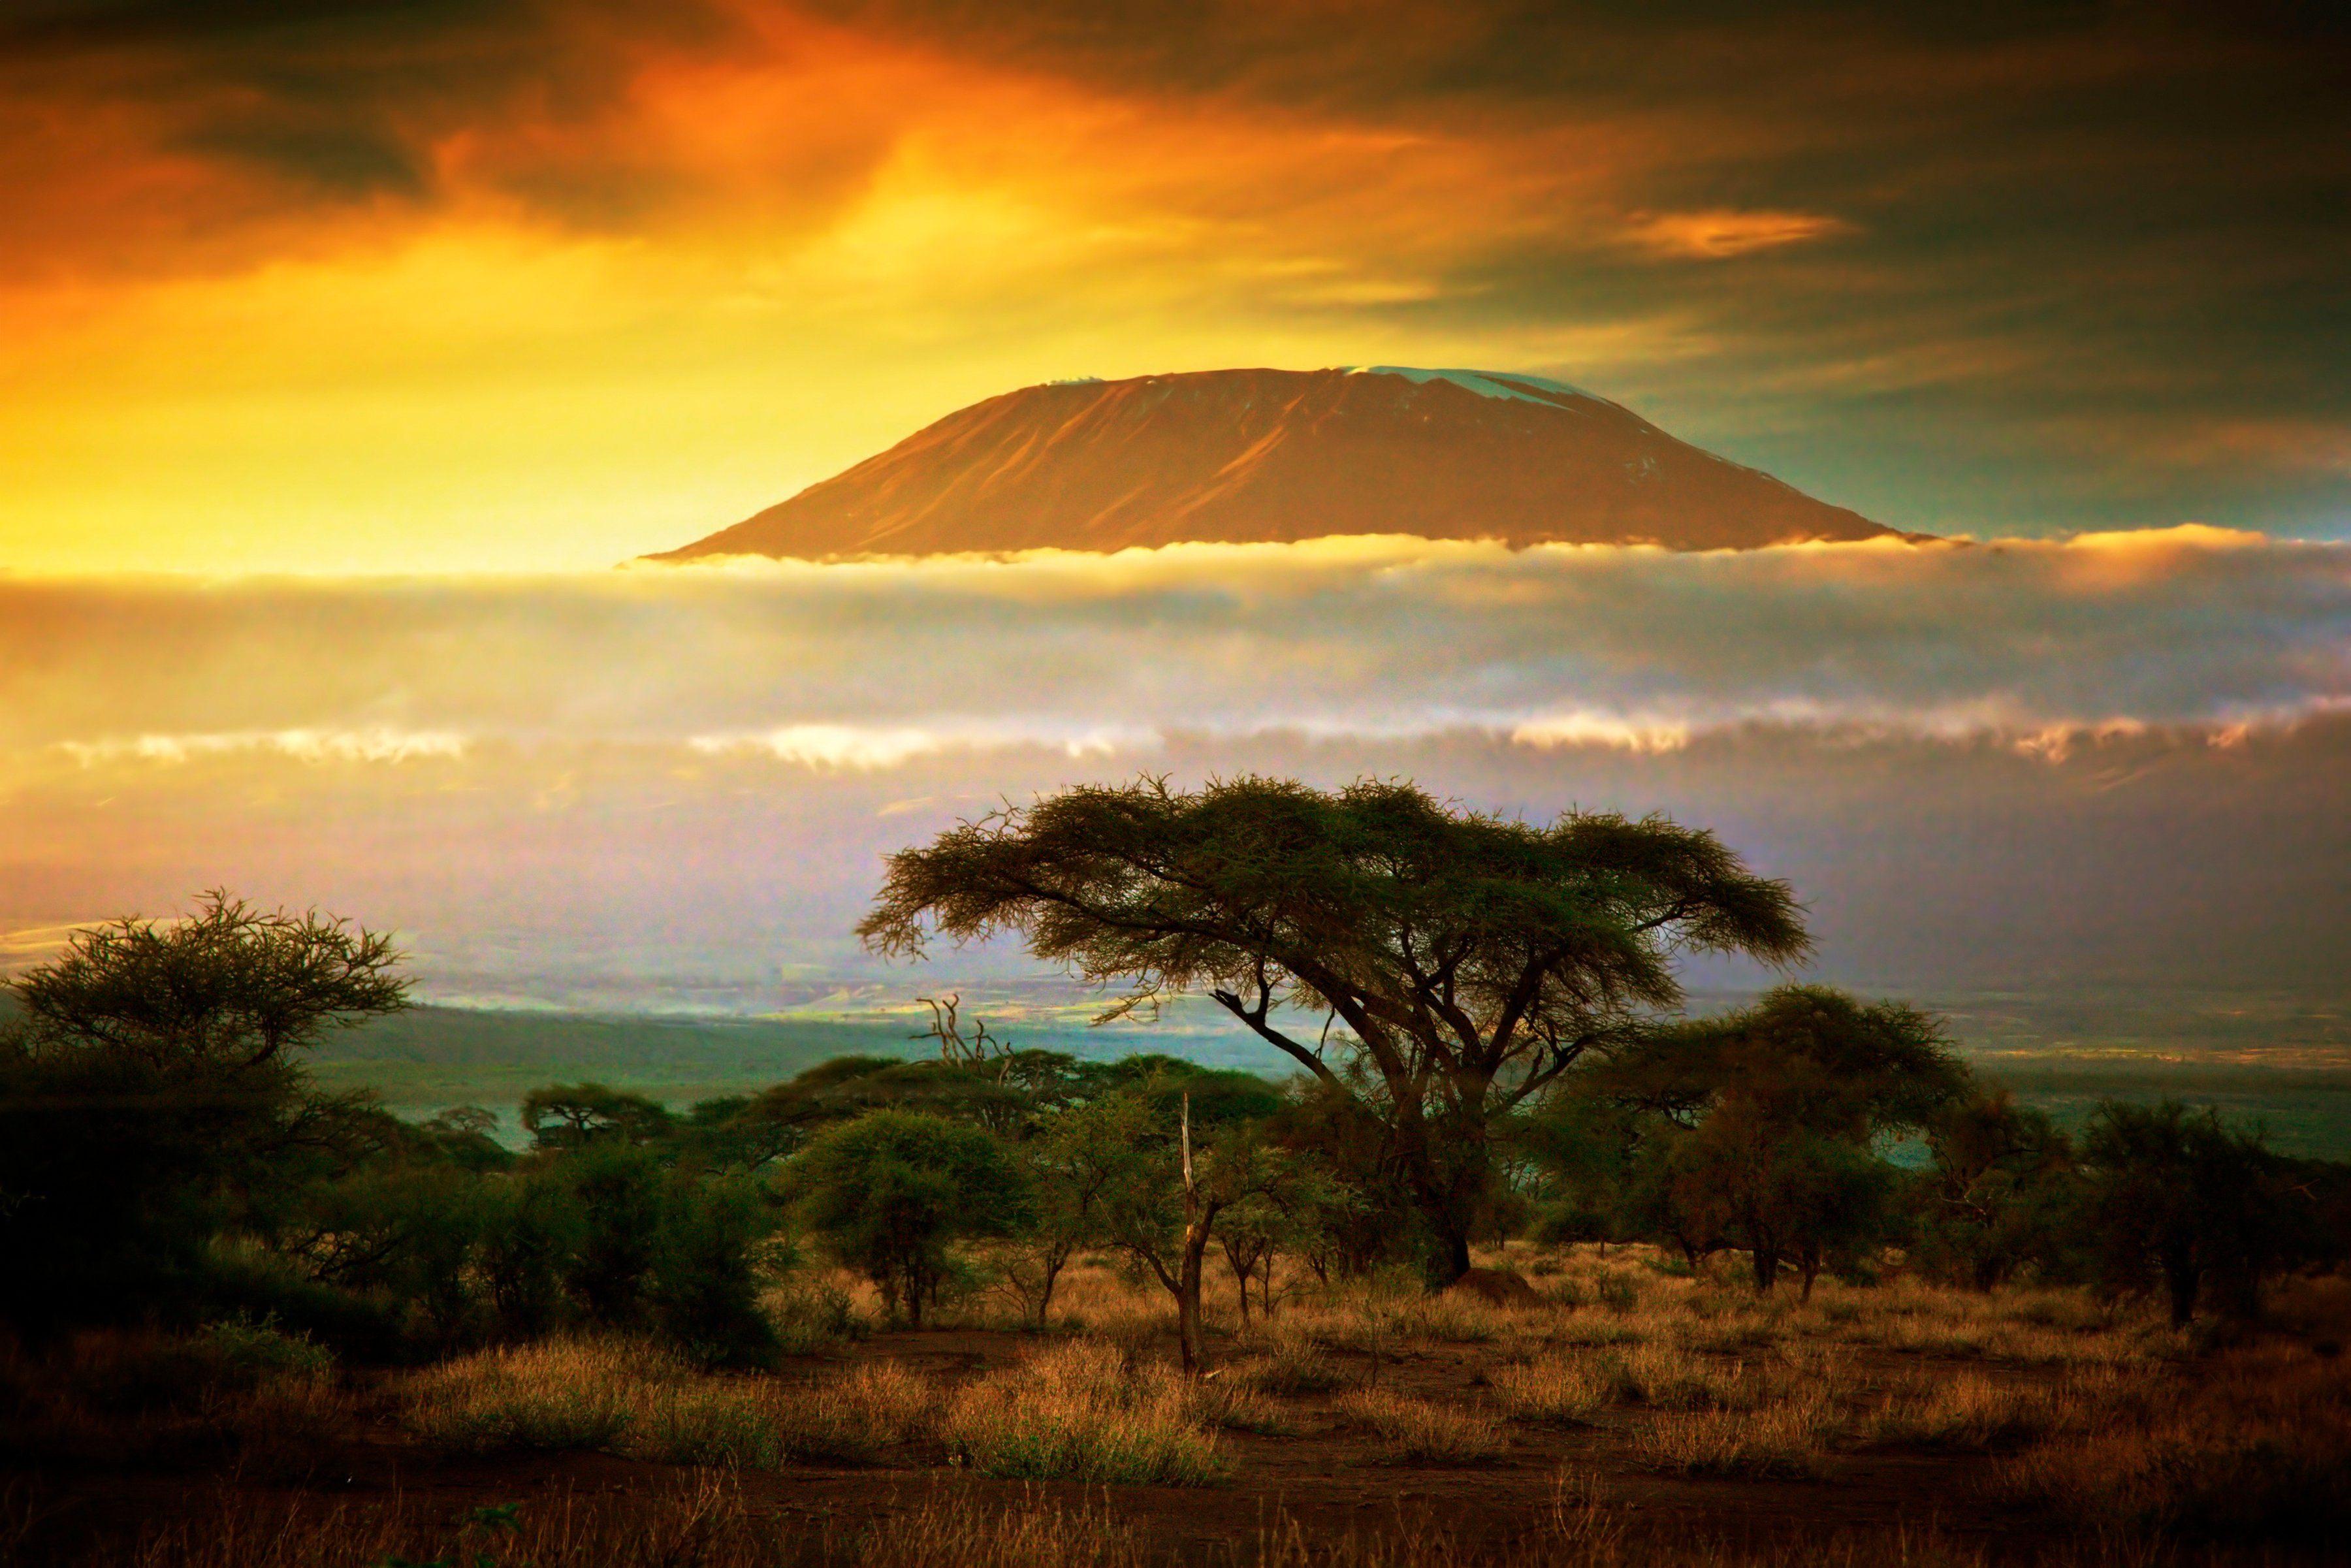 PAPERMOON Fototapete »Mount Kilimanjaro and Clouds«, BlueBack, 7 Bahnen, 350 x 260 cm